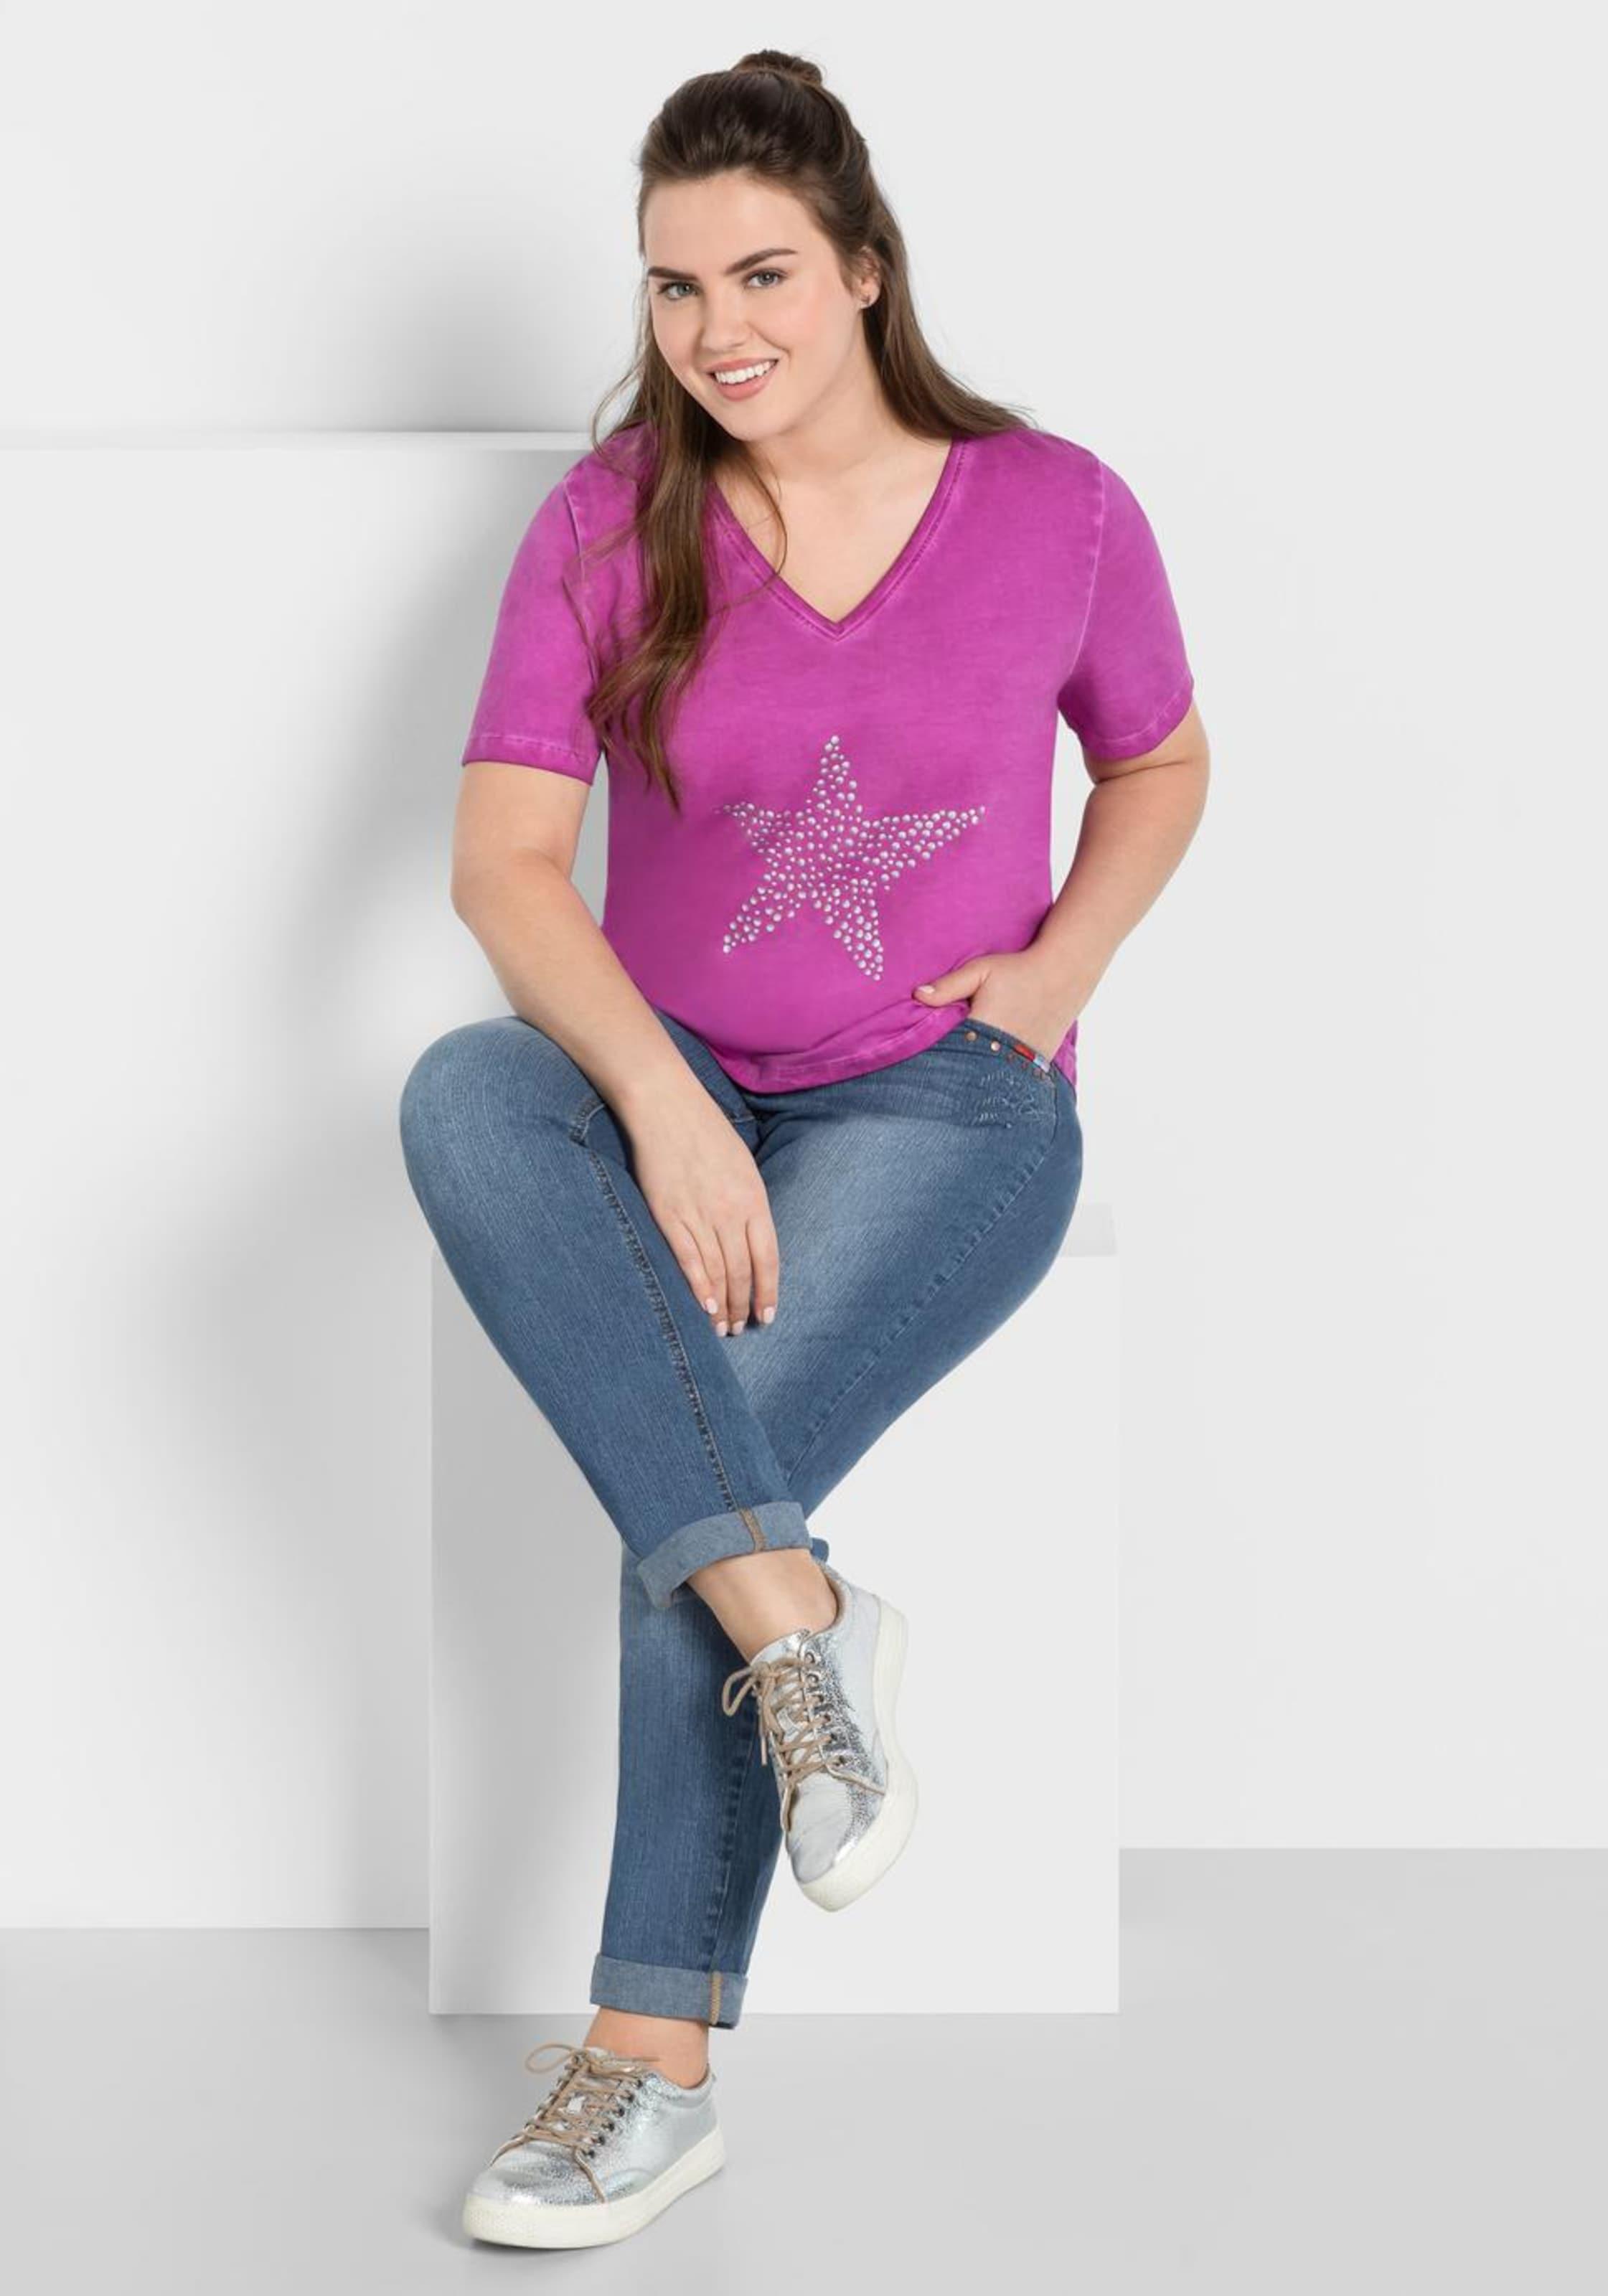 T In Sheego FuchsiaSilber shirt In FuchsiaSilber T Sheego Sheego shirt nwZkP0N8OX